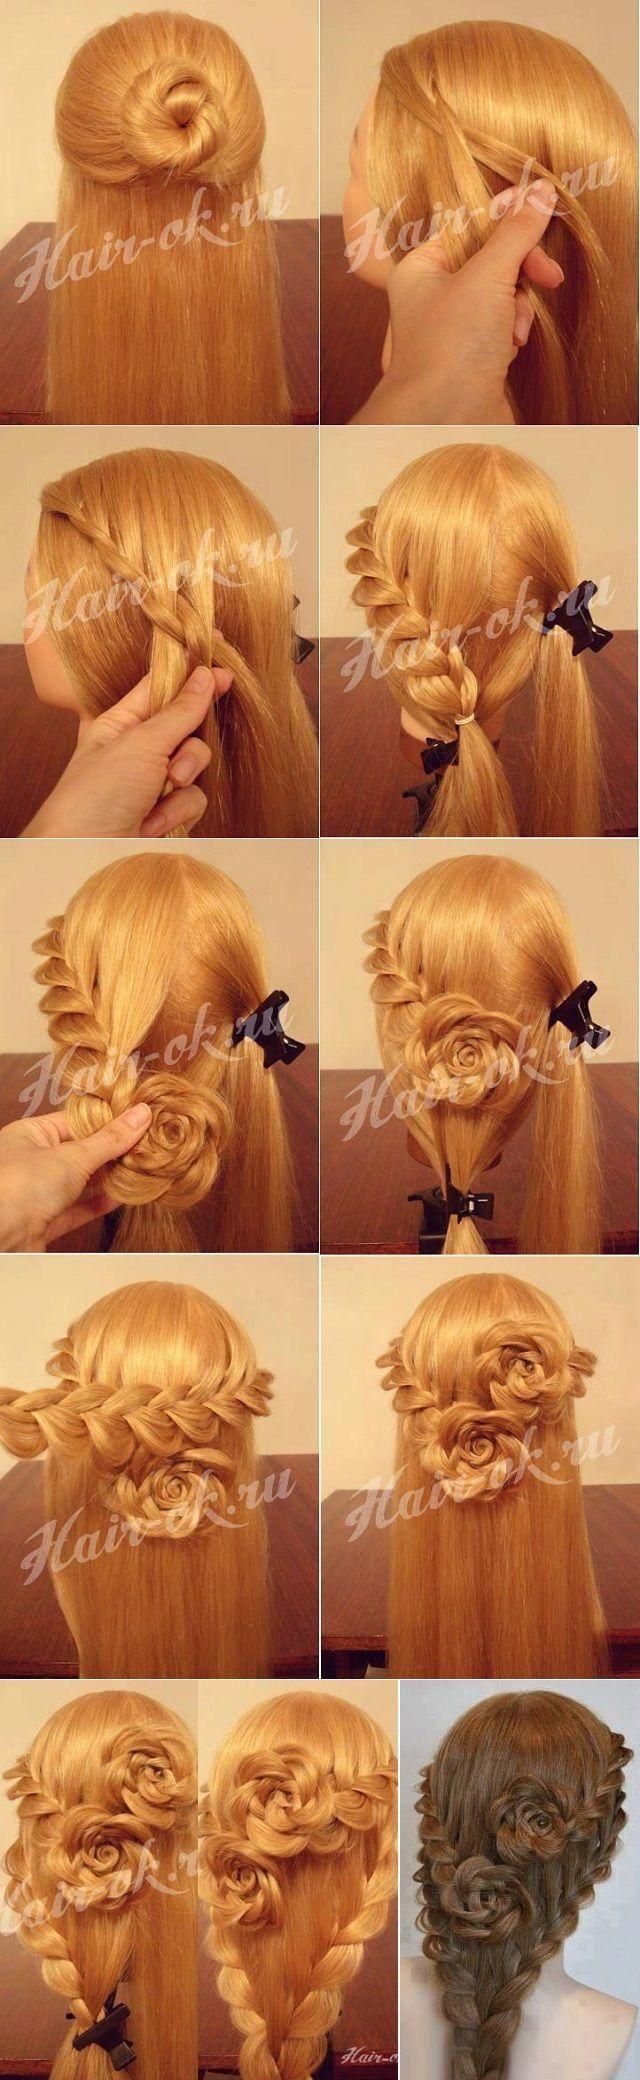 Wedding Hairstyles - Hair And Makeup And Pretty Things #1981629 - Weddbook